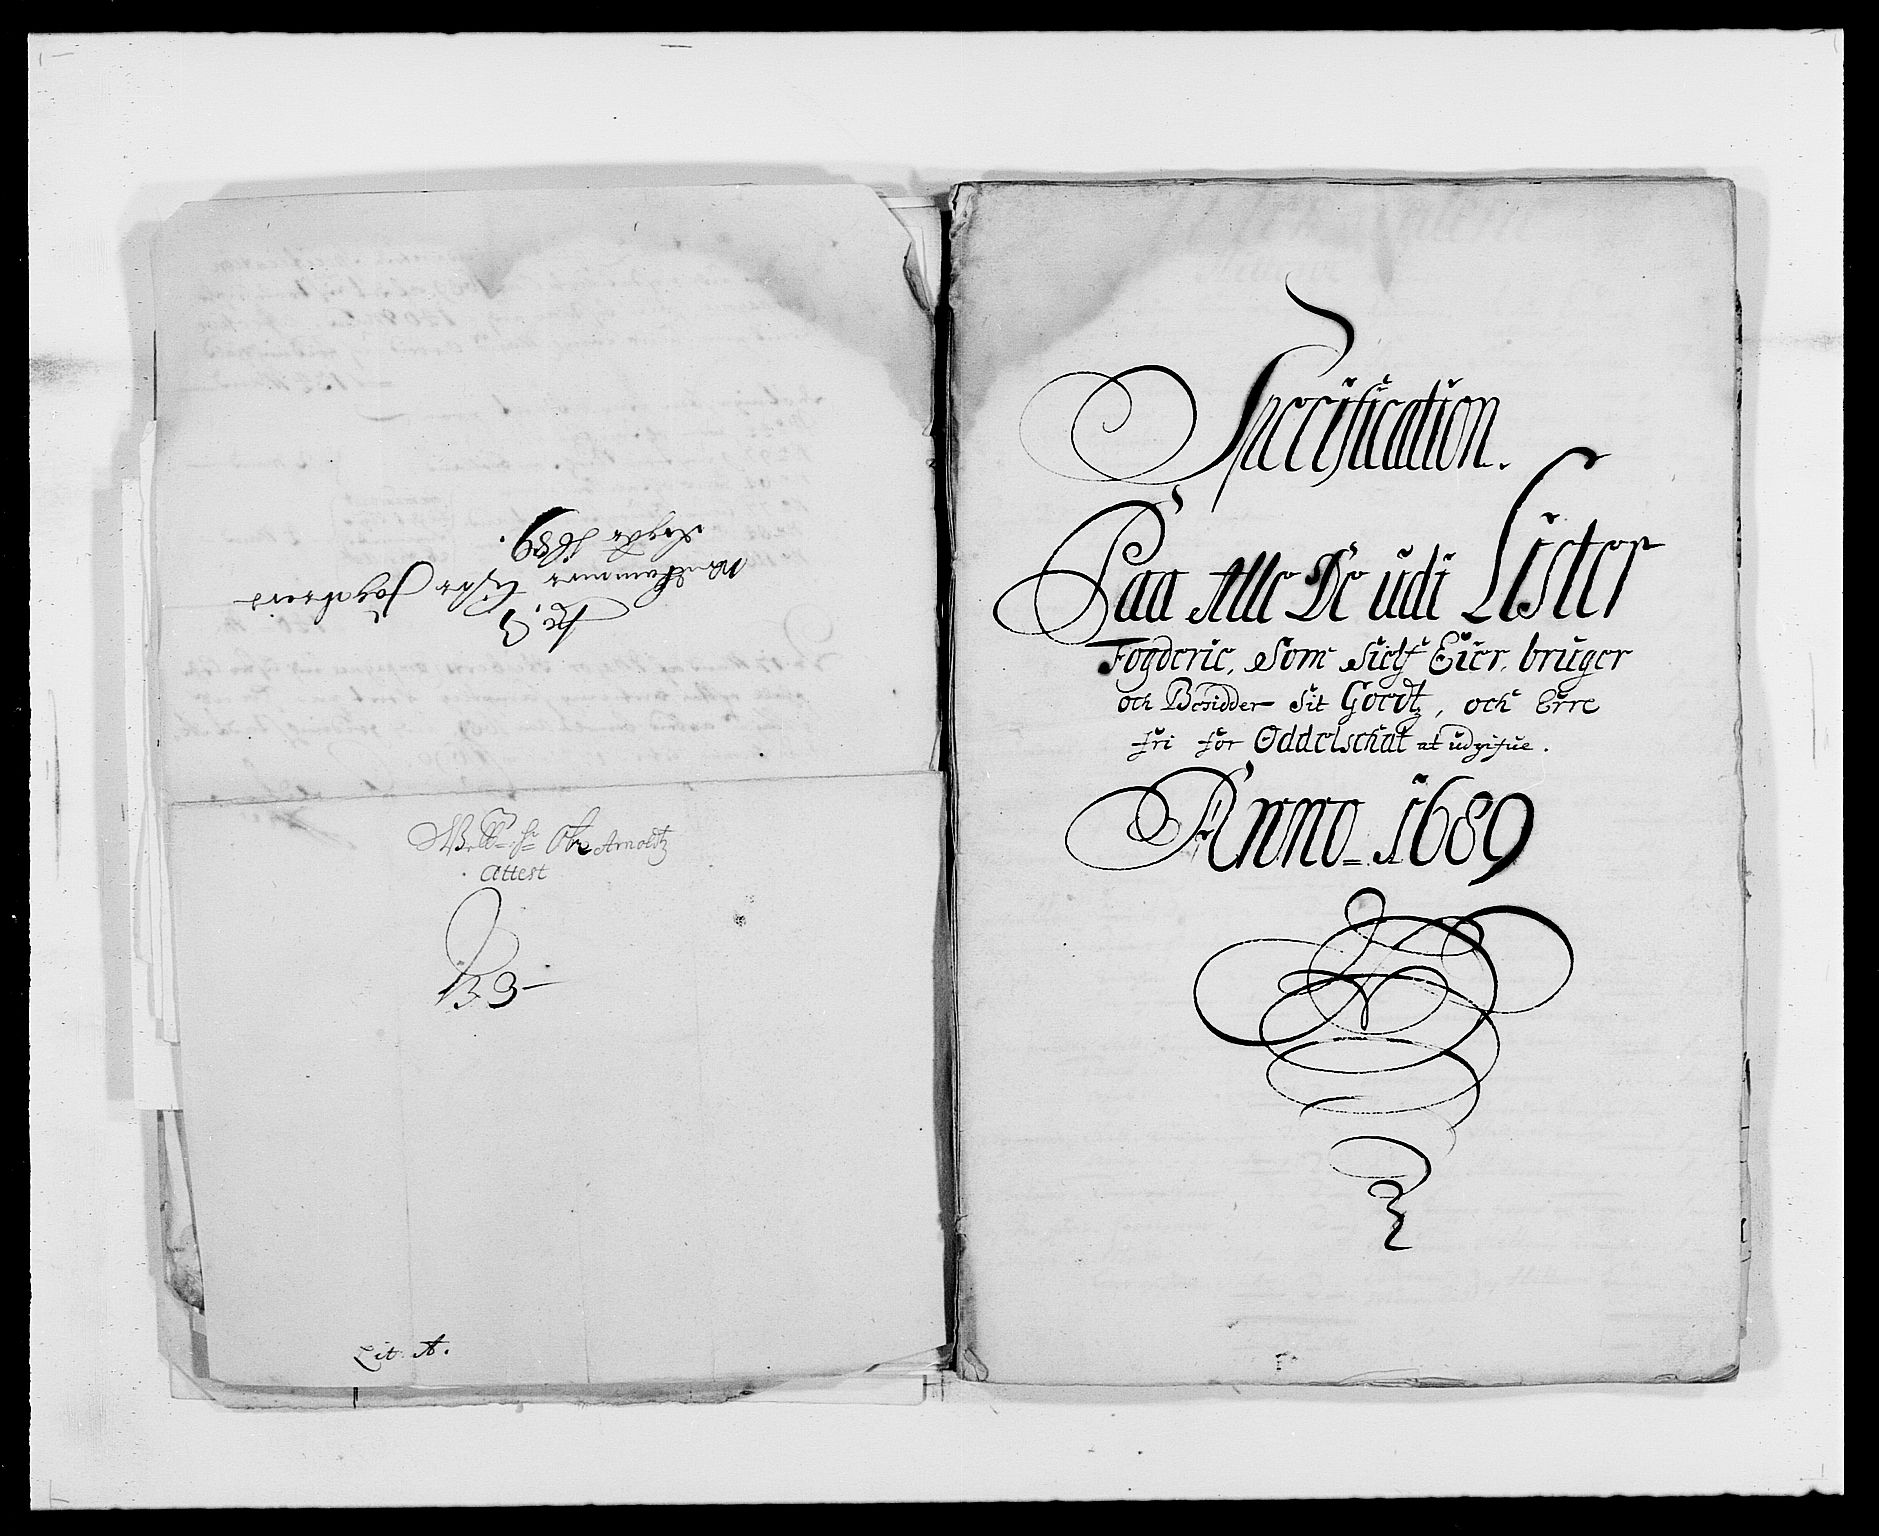 RA, Rentekammeret inntil 1814, Reviderte regnskaper, Fogderegnskap, R41/L2535: Fogderegnskap Lista, 1686-1689, s. 56